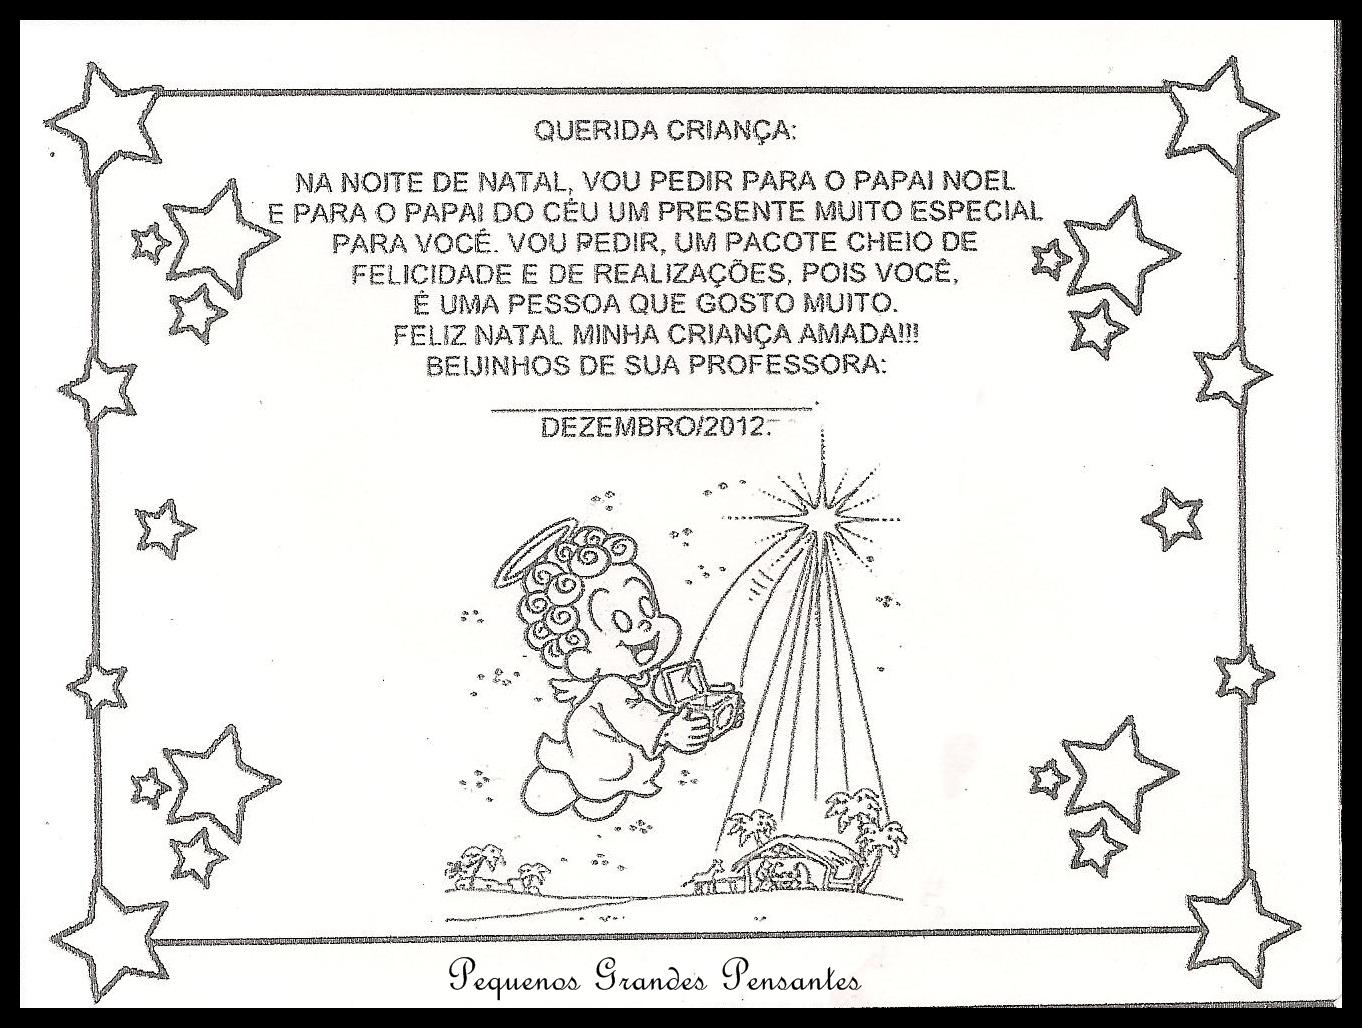 Pequenos Grandes Pensantes Cartoes De Natal Para Educacao Infantil